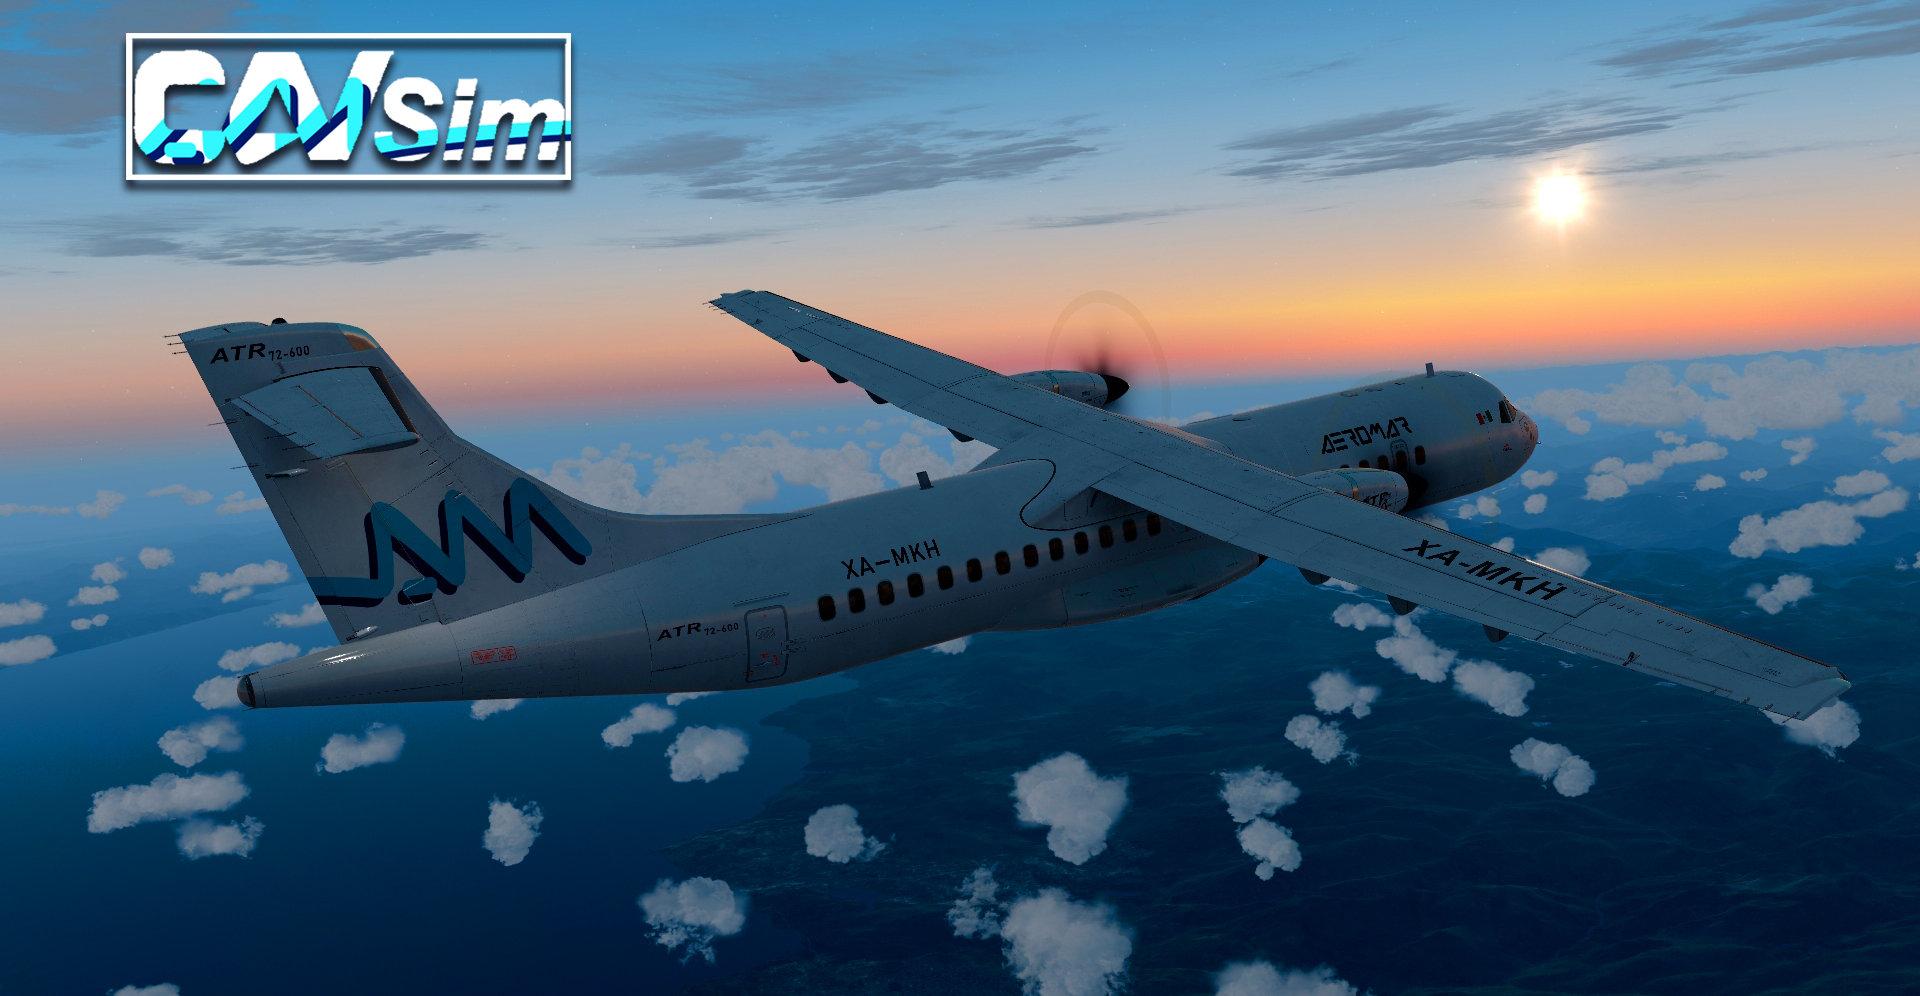 Avions de Transport Regional ATR 72-600 Aeromar 'White Livery' 'XA-MKH'